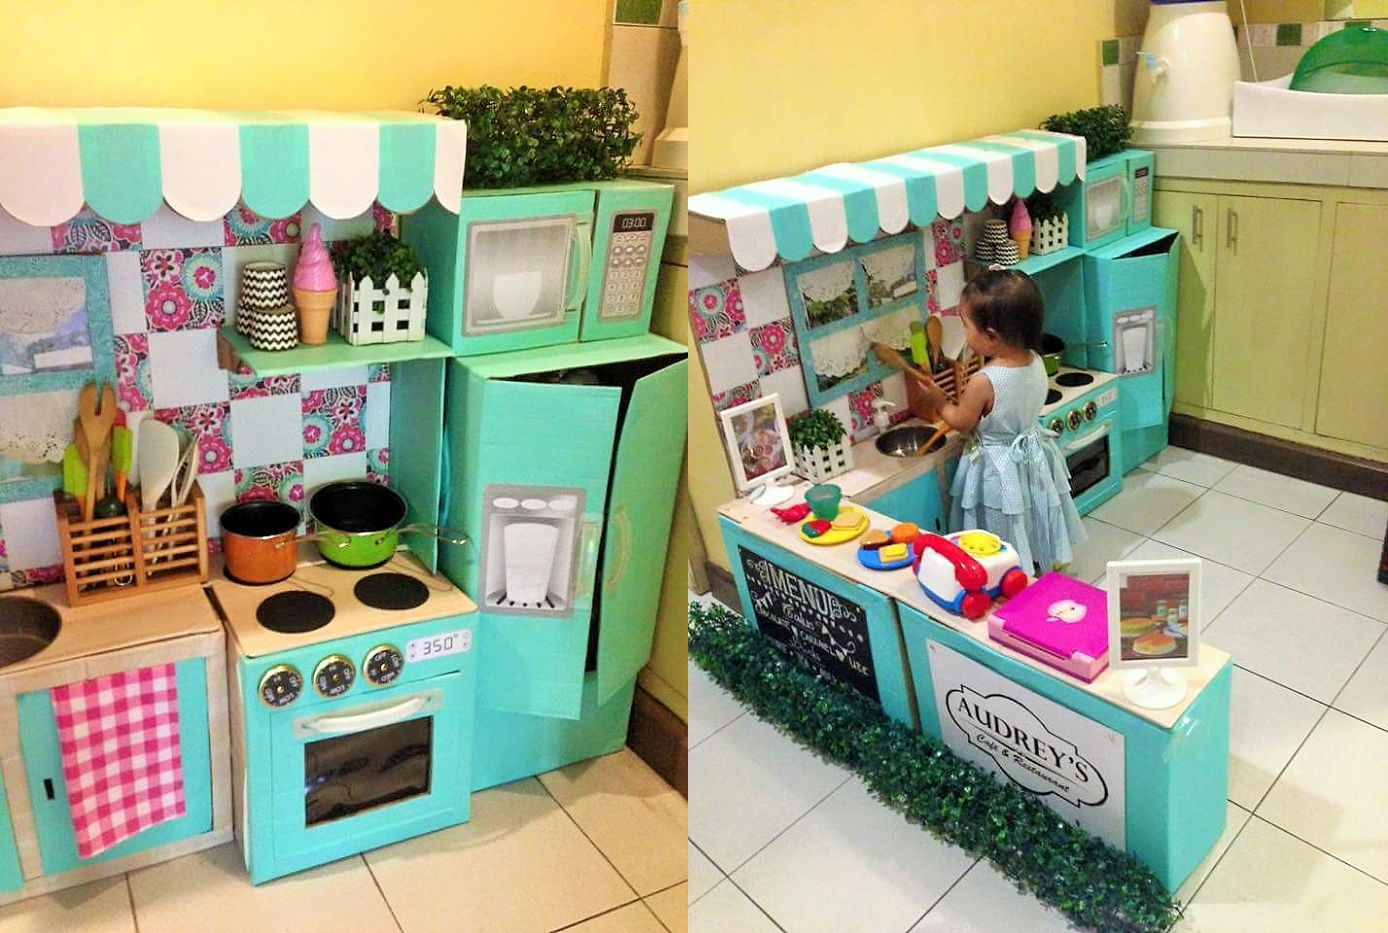 Una cucina di cartone fai da te per bambini felici  Bigodino